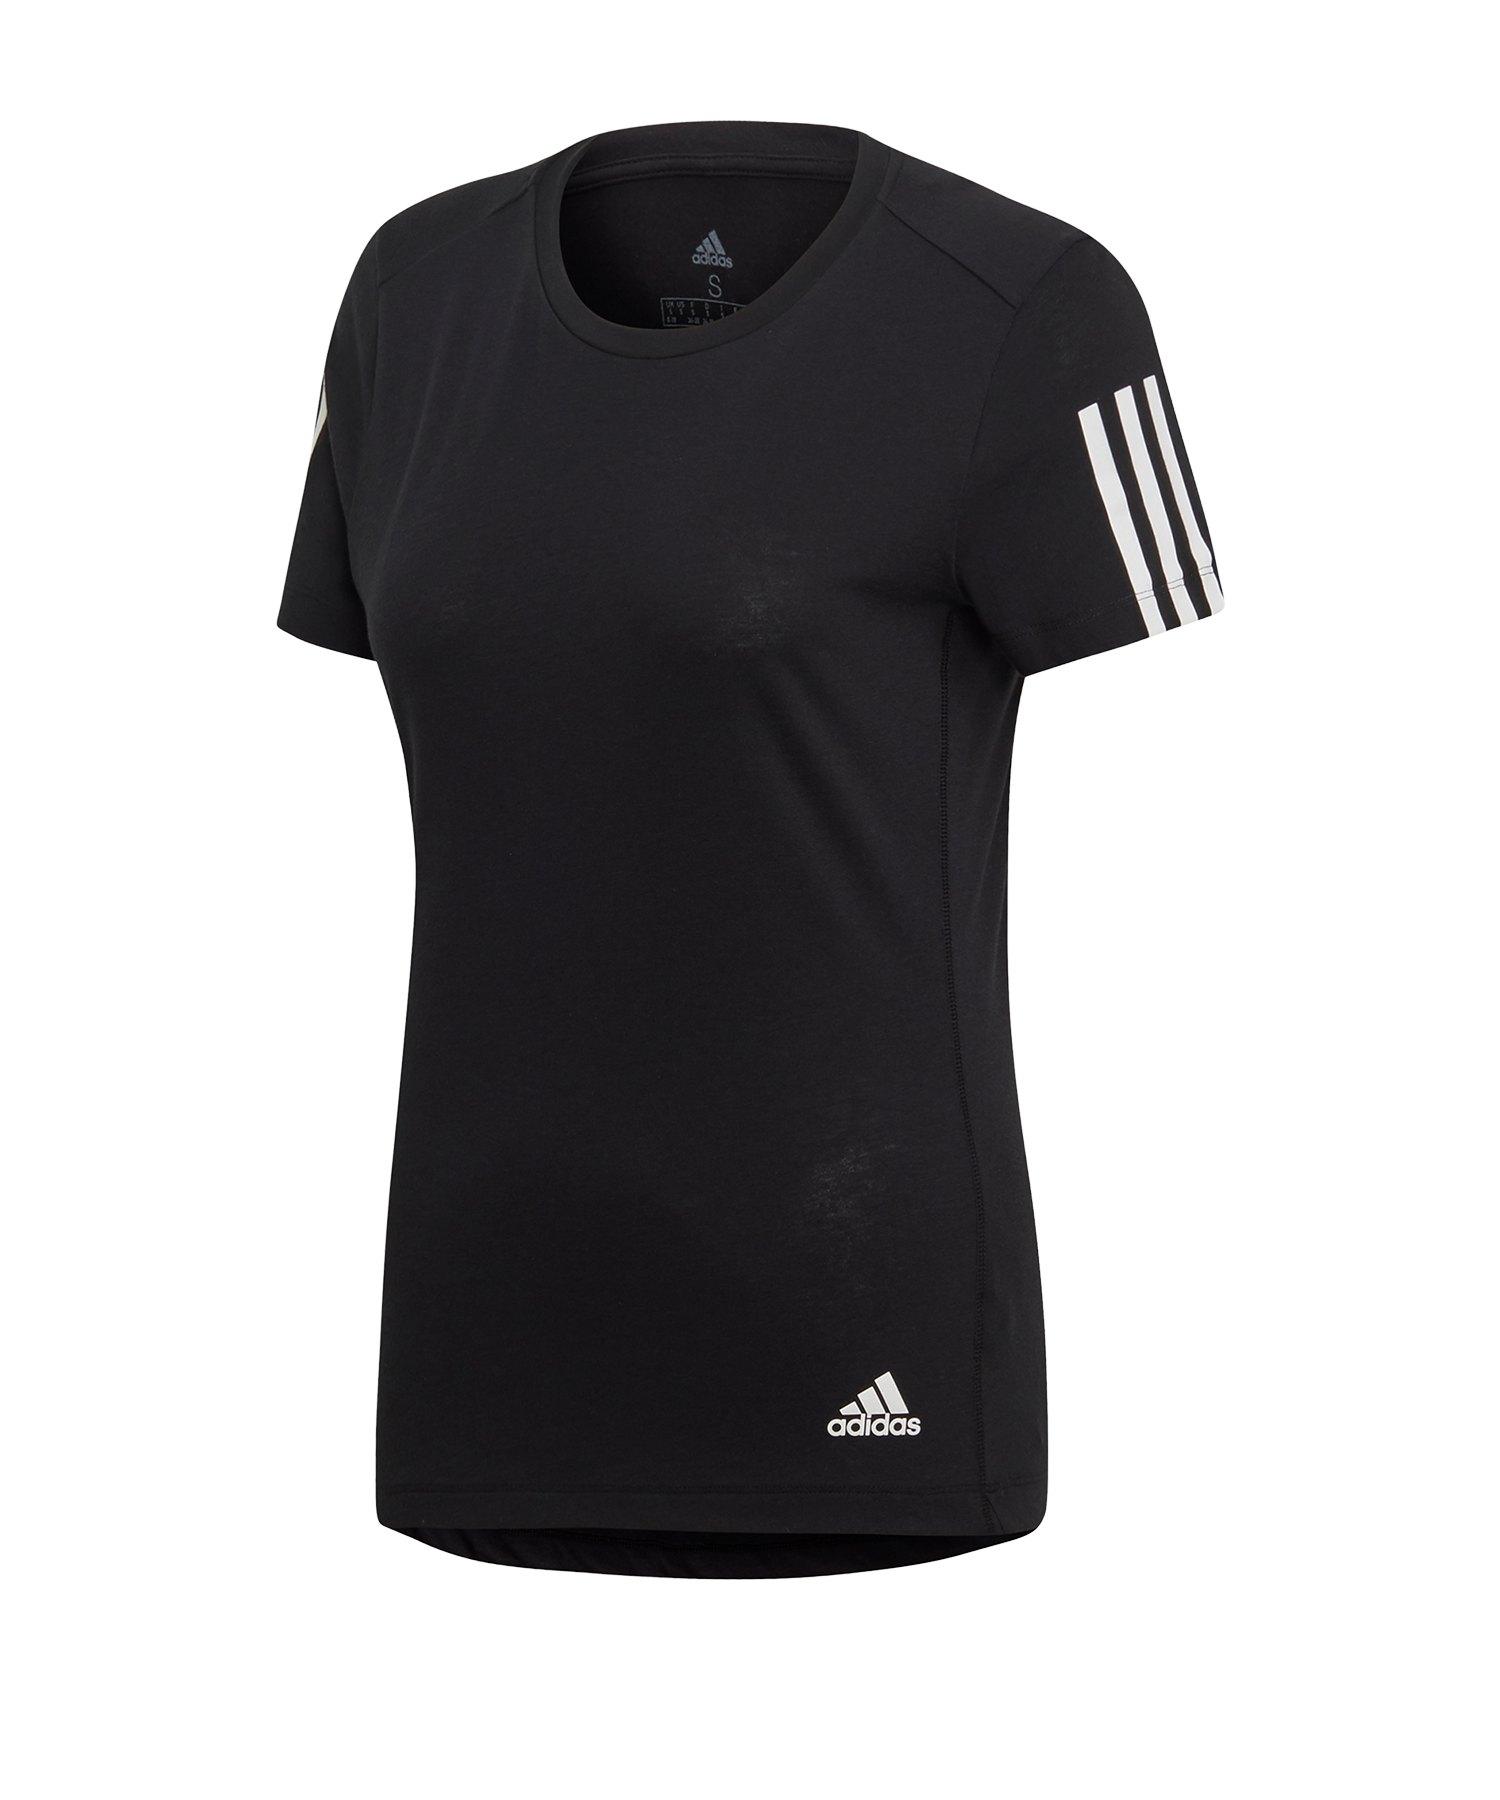 adidas Run It Tee T-Shirt Running Damen Schwarz - schwarz